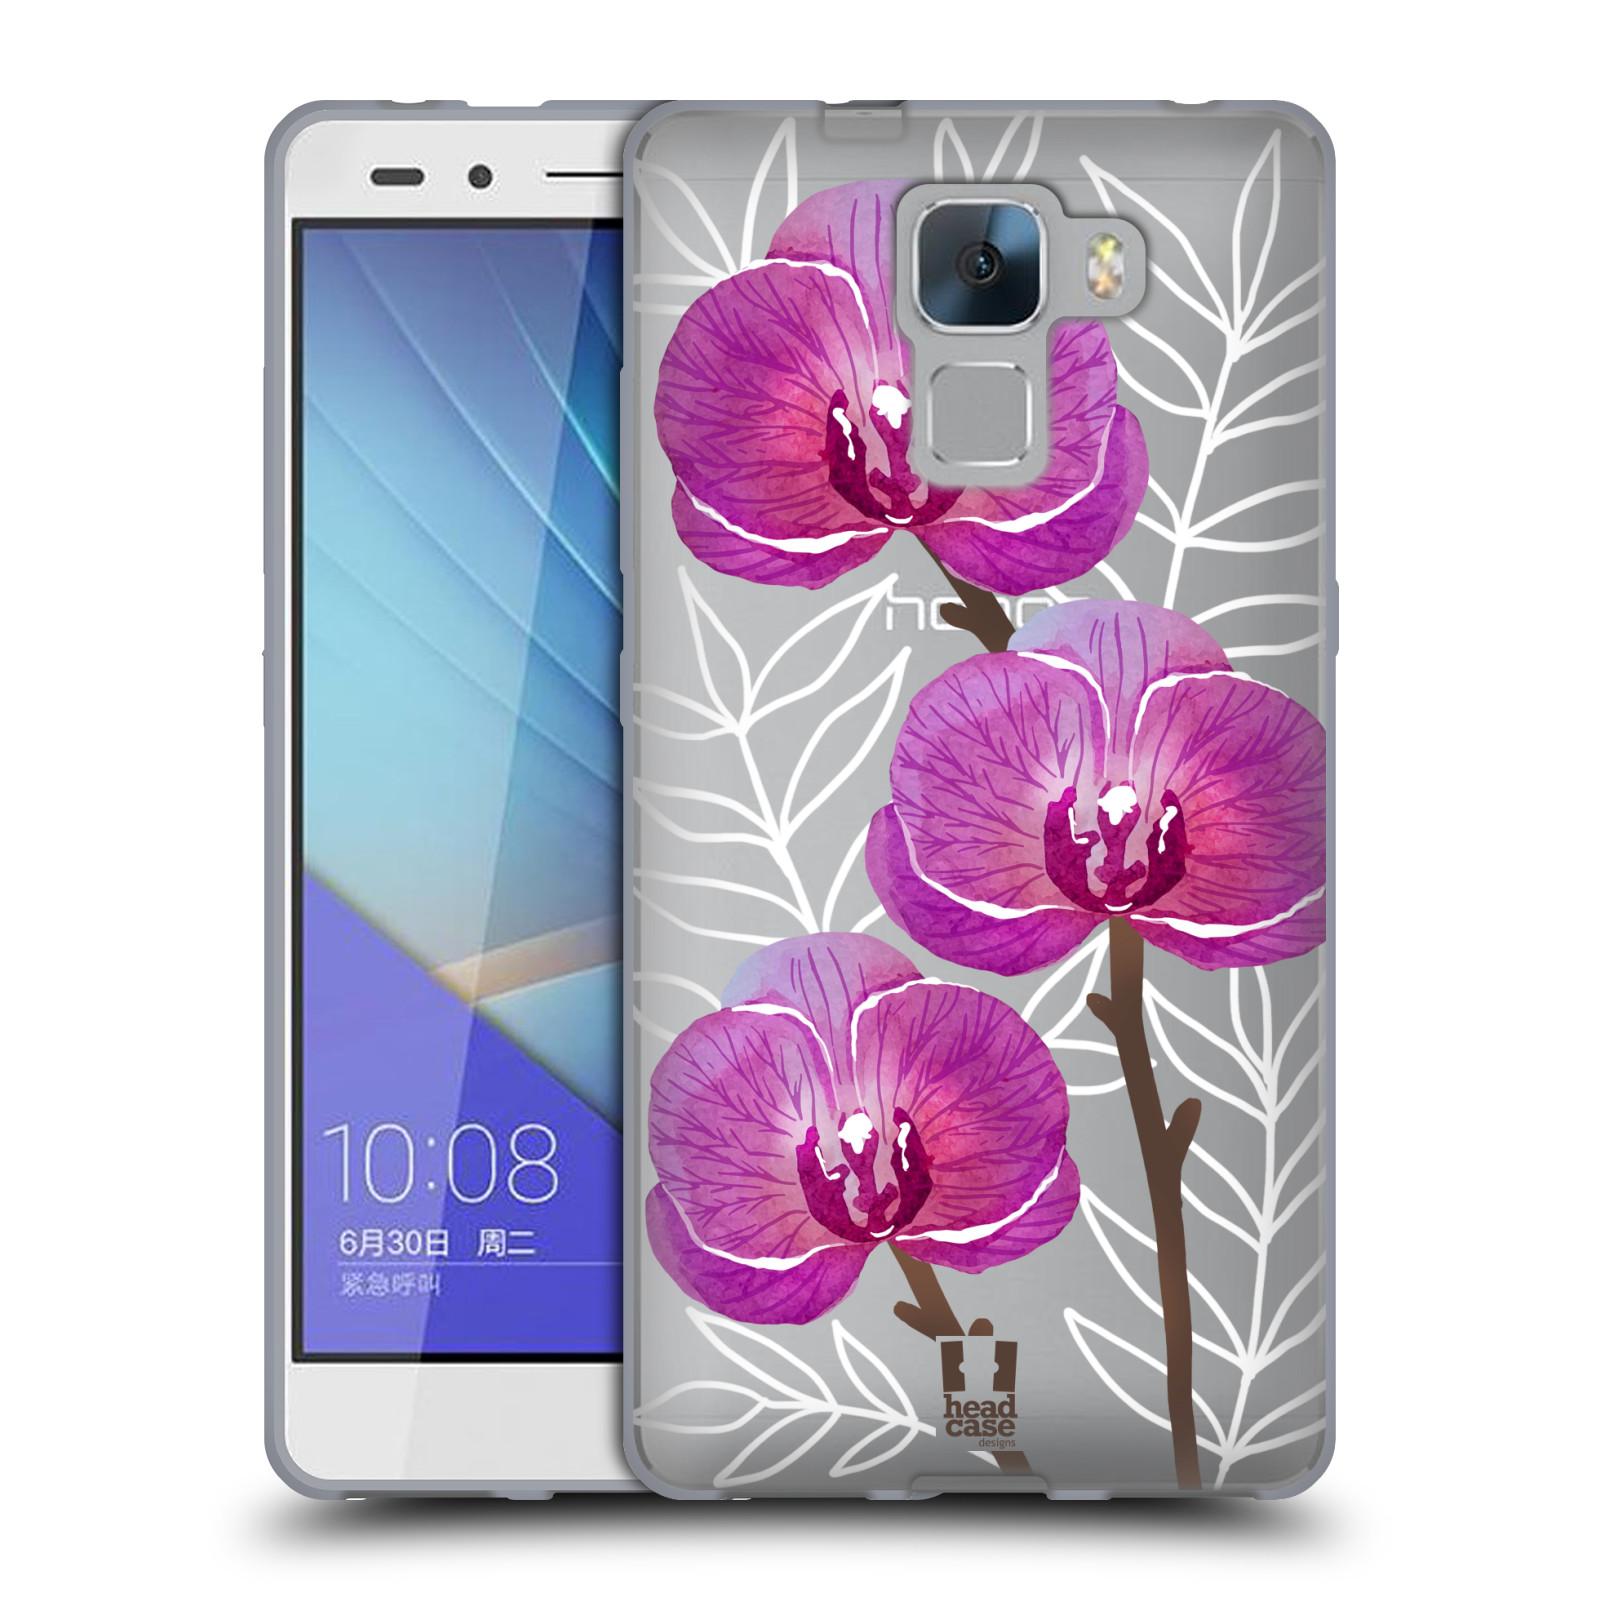 Silikonové pouzdro na mobil Honor 7 - Head Case - Hezoučké kvítky - průhledné